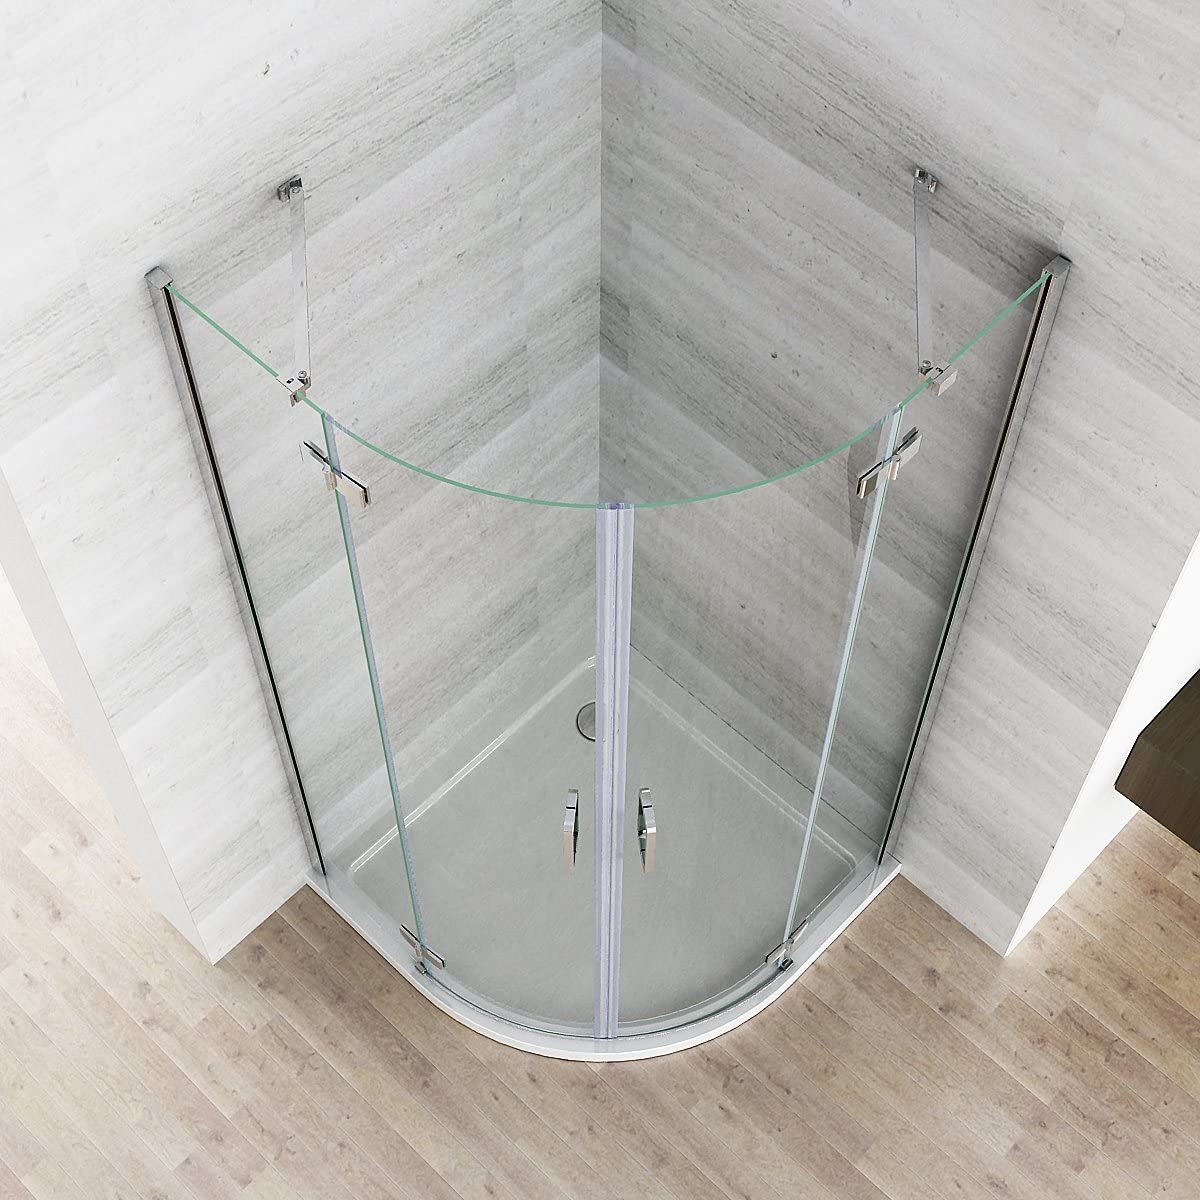 80 x 80 x 195 cm cabinas de ducha redonda ducha Cuadrante Mampara ...